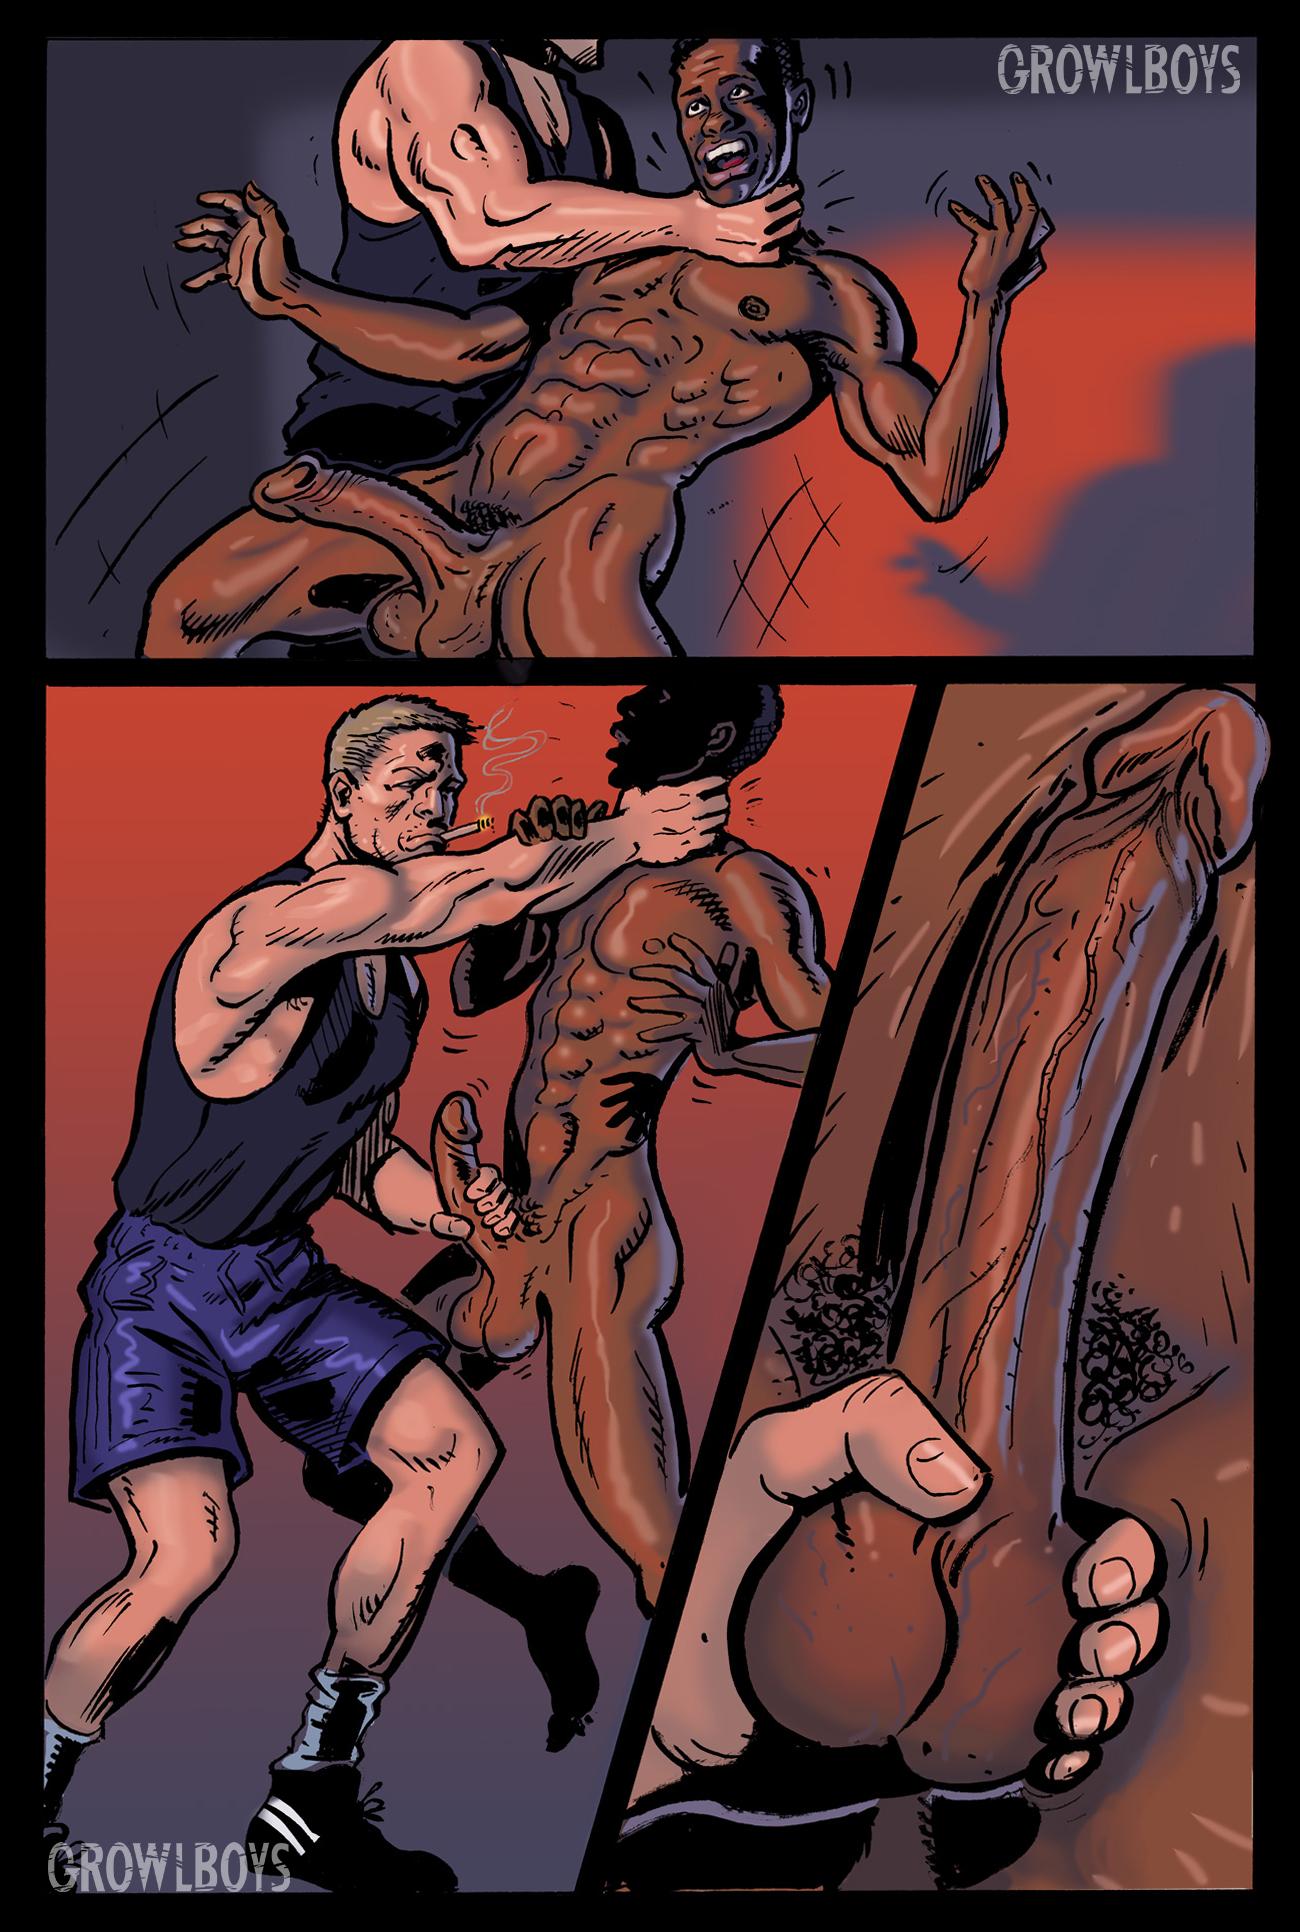 Forced Comic Porn freak juice | growlboys gay transformation porn